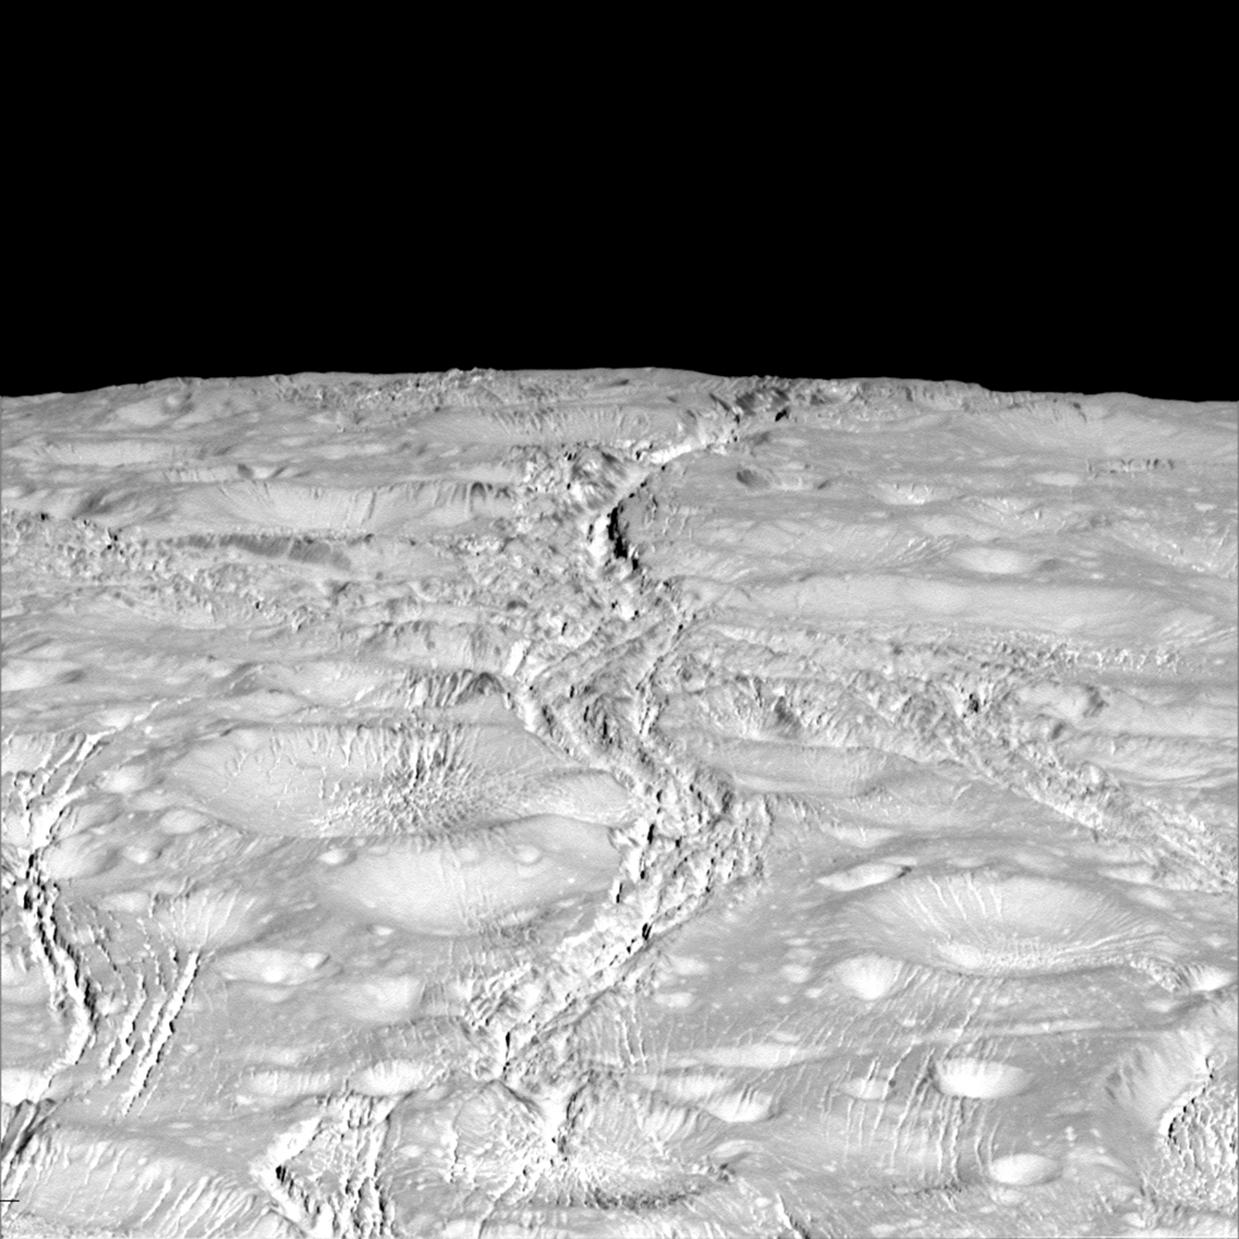 O Pólo Norte de Encelado, com crateras e fracturas (2015)